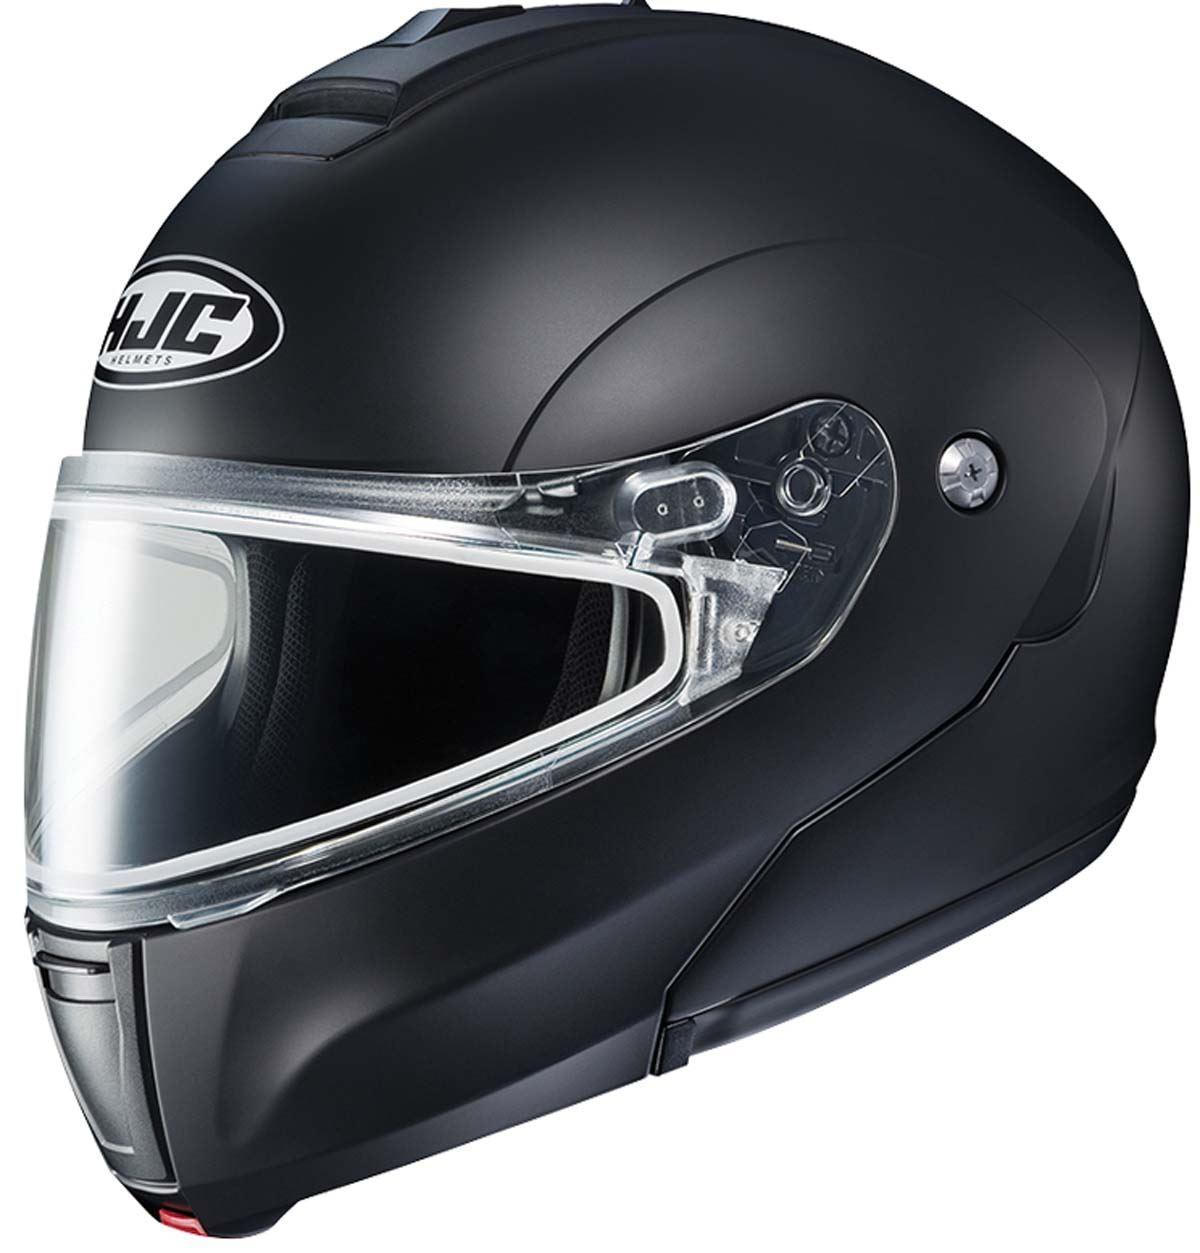 HJC-CL-Max-III-Snow-Helmet-Flip-Up-Modular-DD-Ring-Interior-Sunshield-DOT-XS-3XL miniature 3